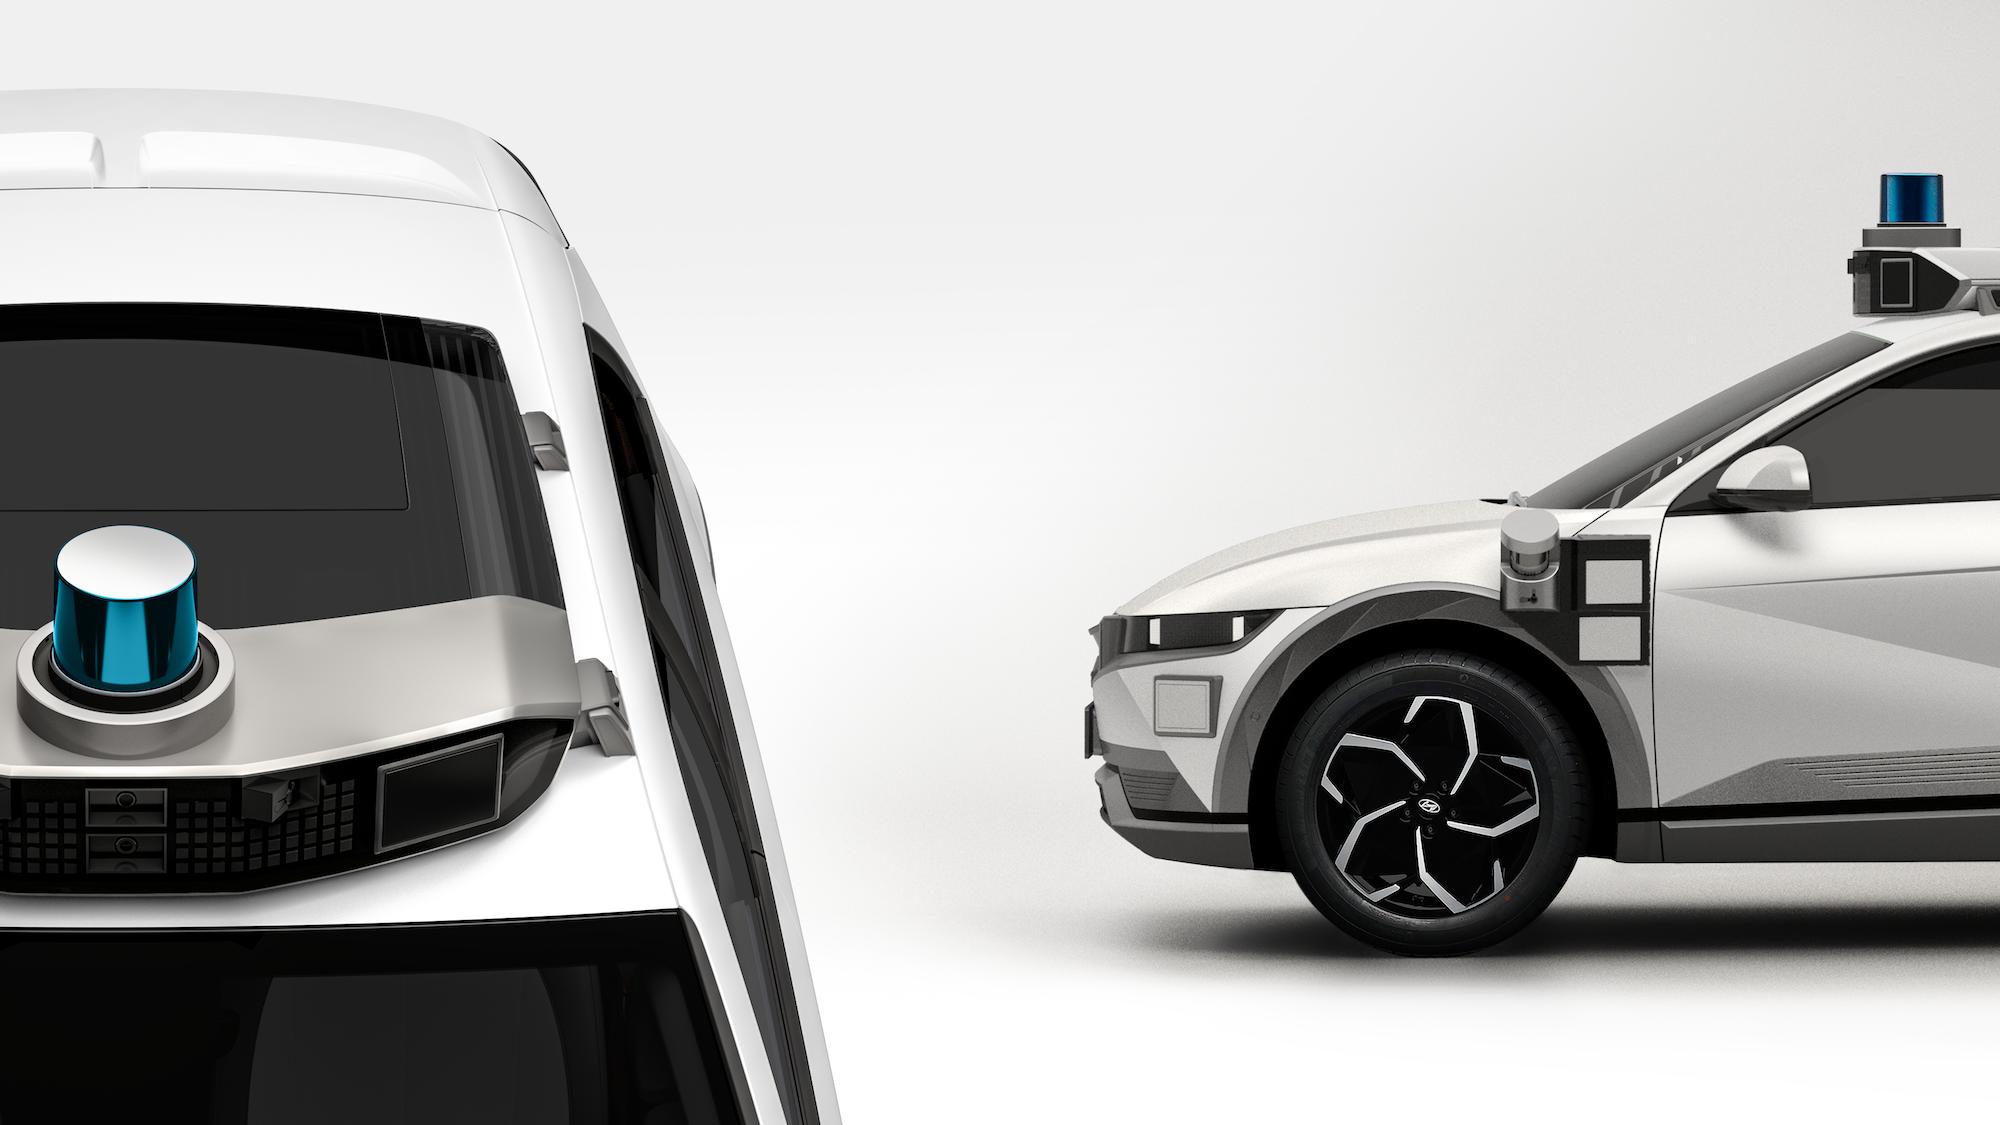 Motional-Hyundai robotaxi Ioniq 5